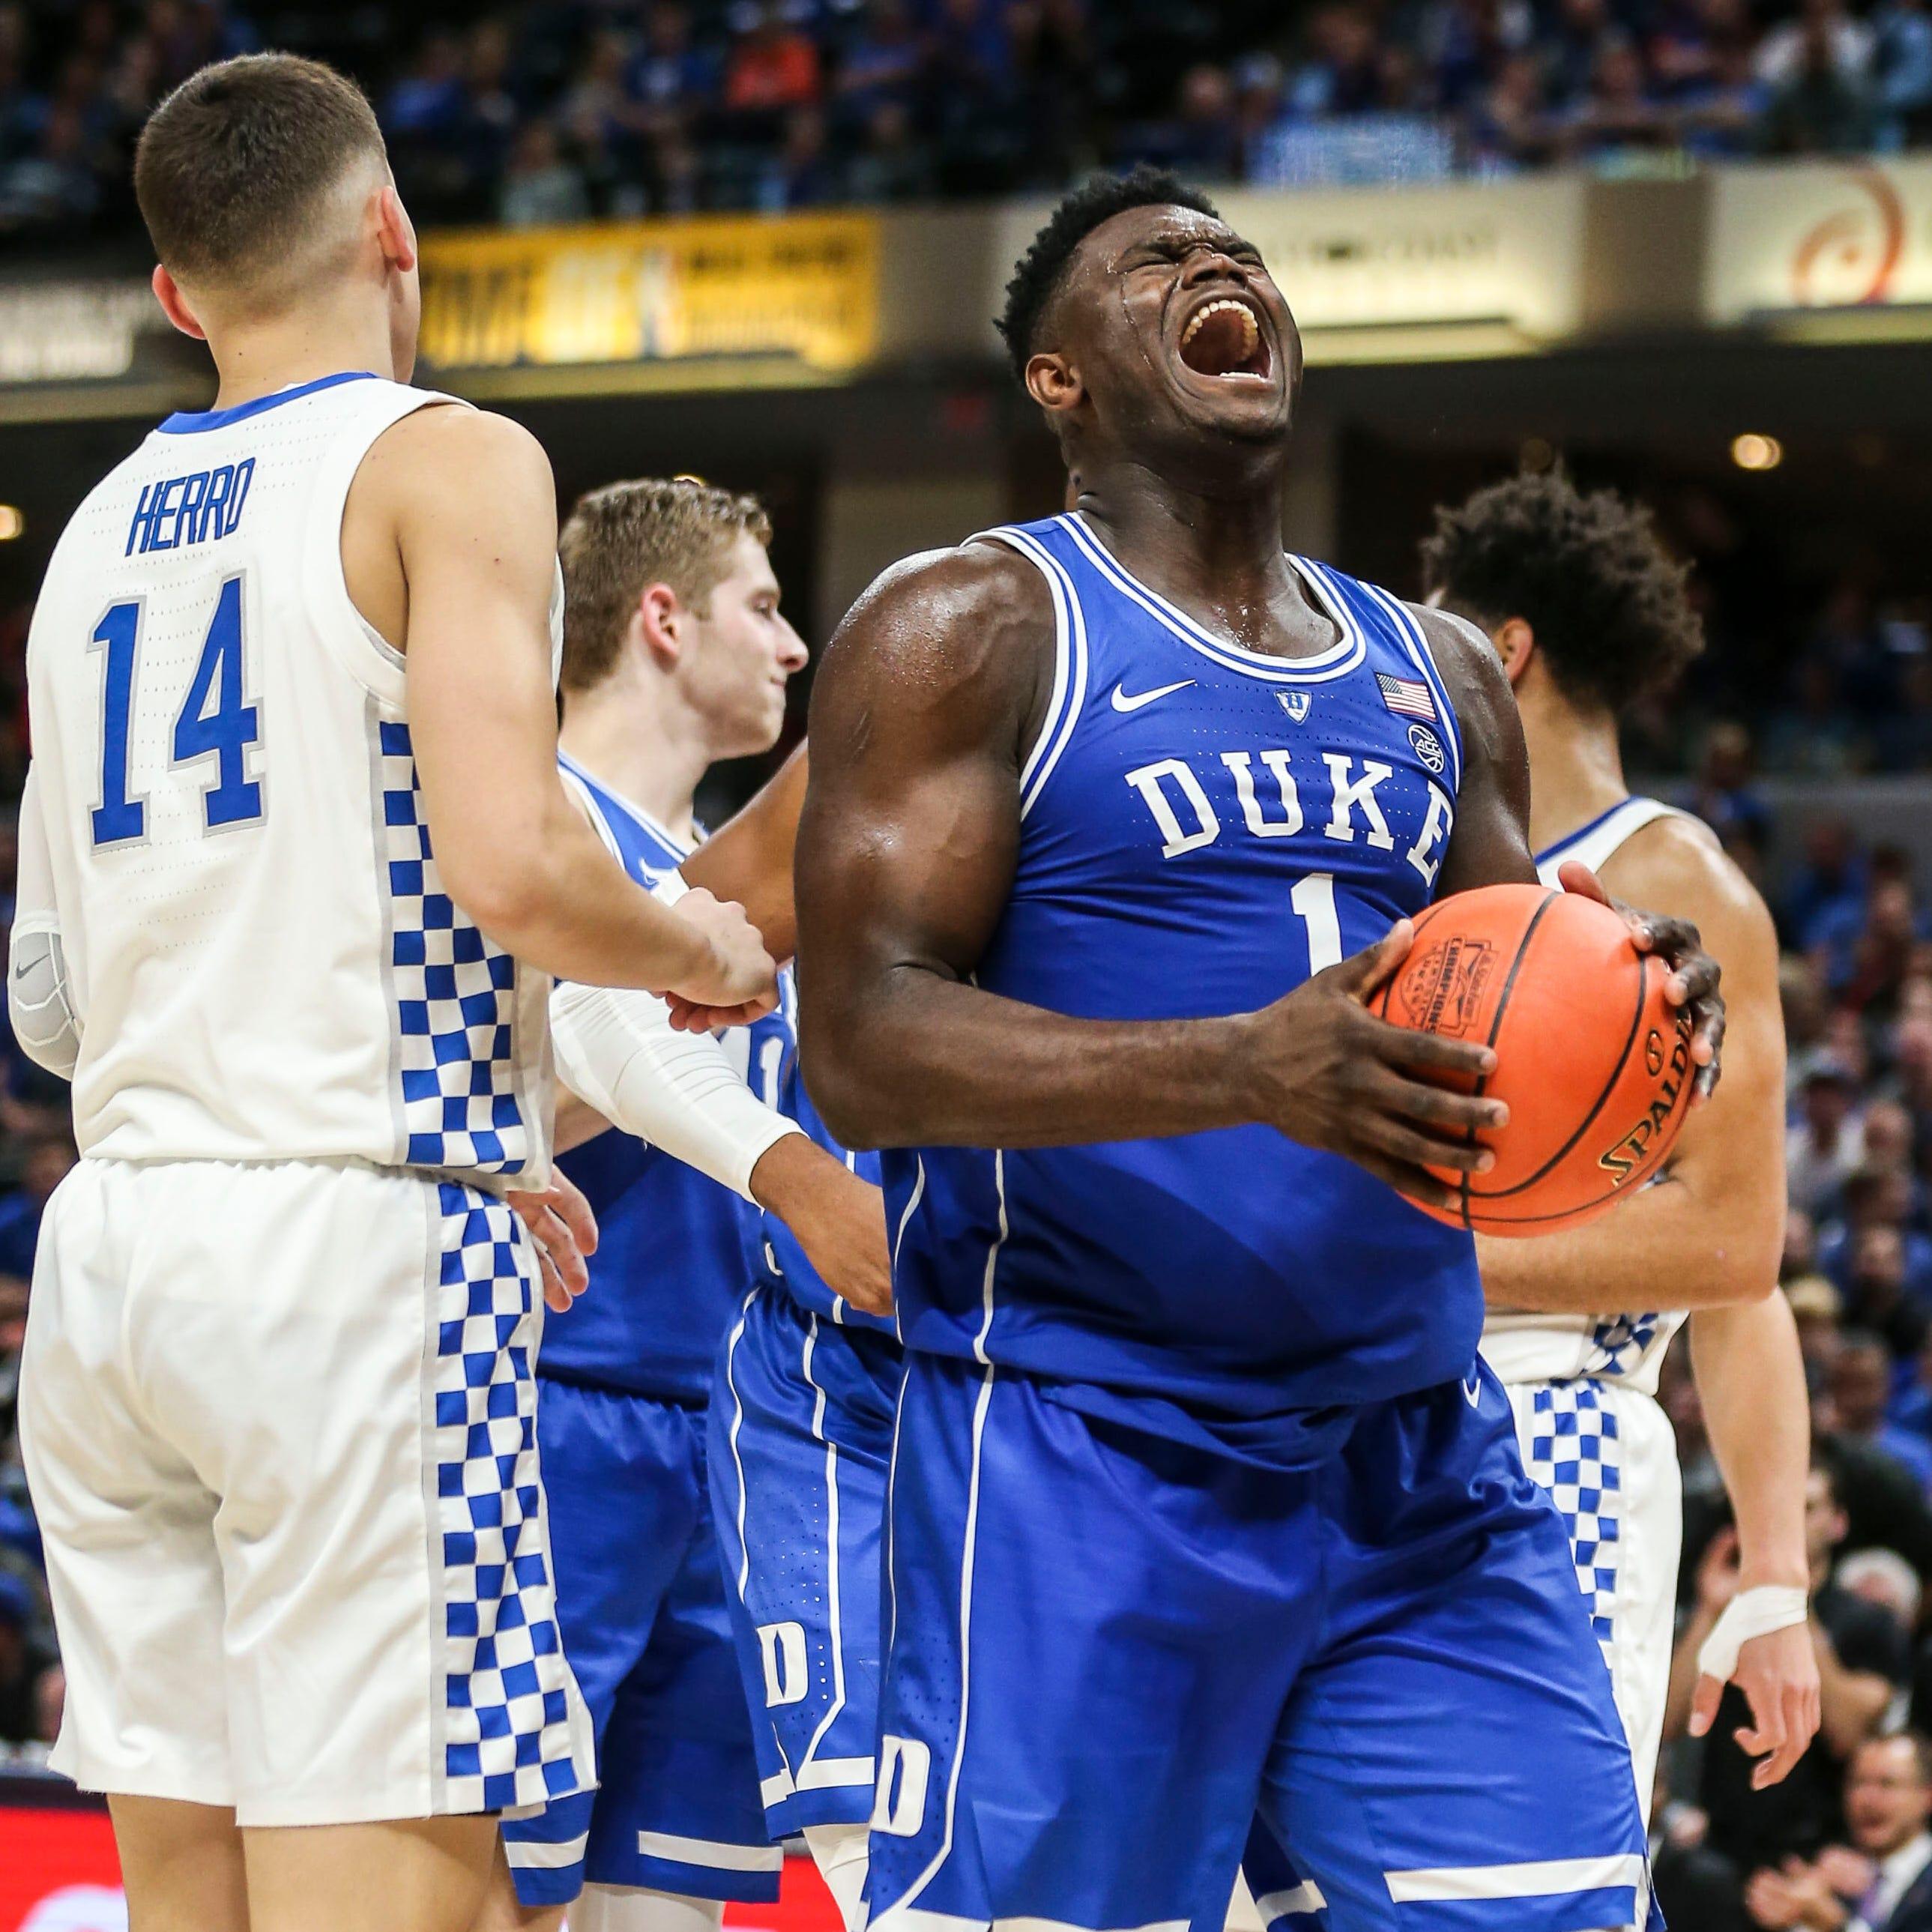 Blue wave? Duke's freshmen were more like a blue tsunami vs. Kentucky